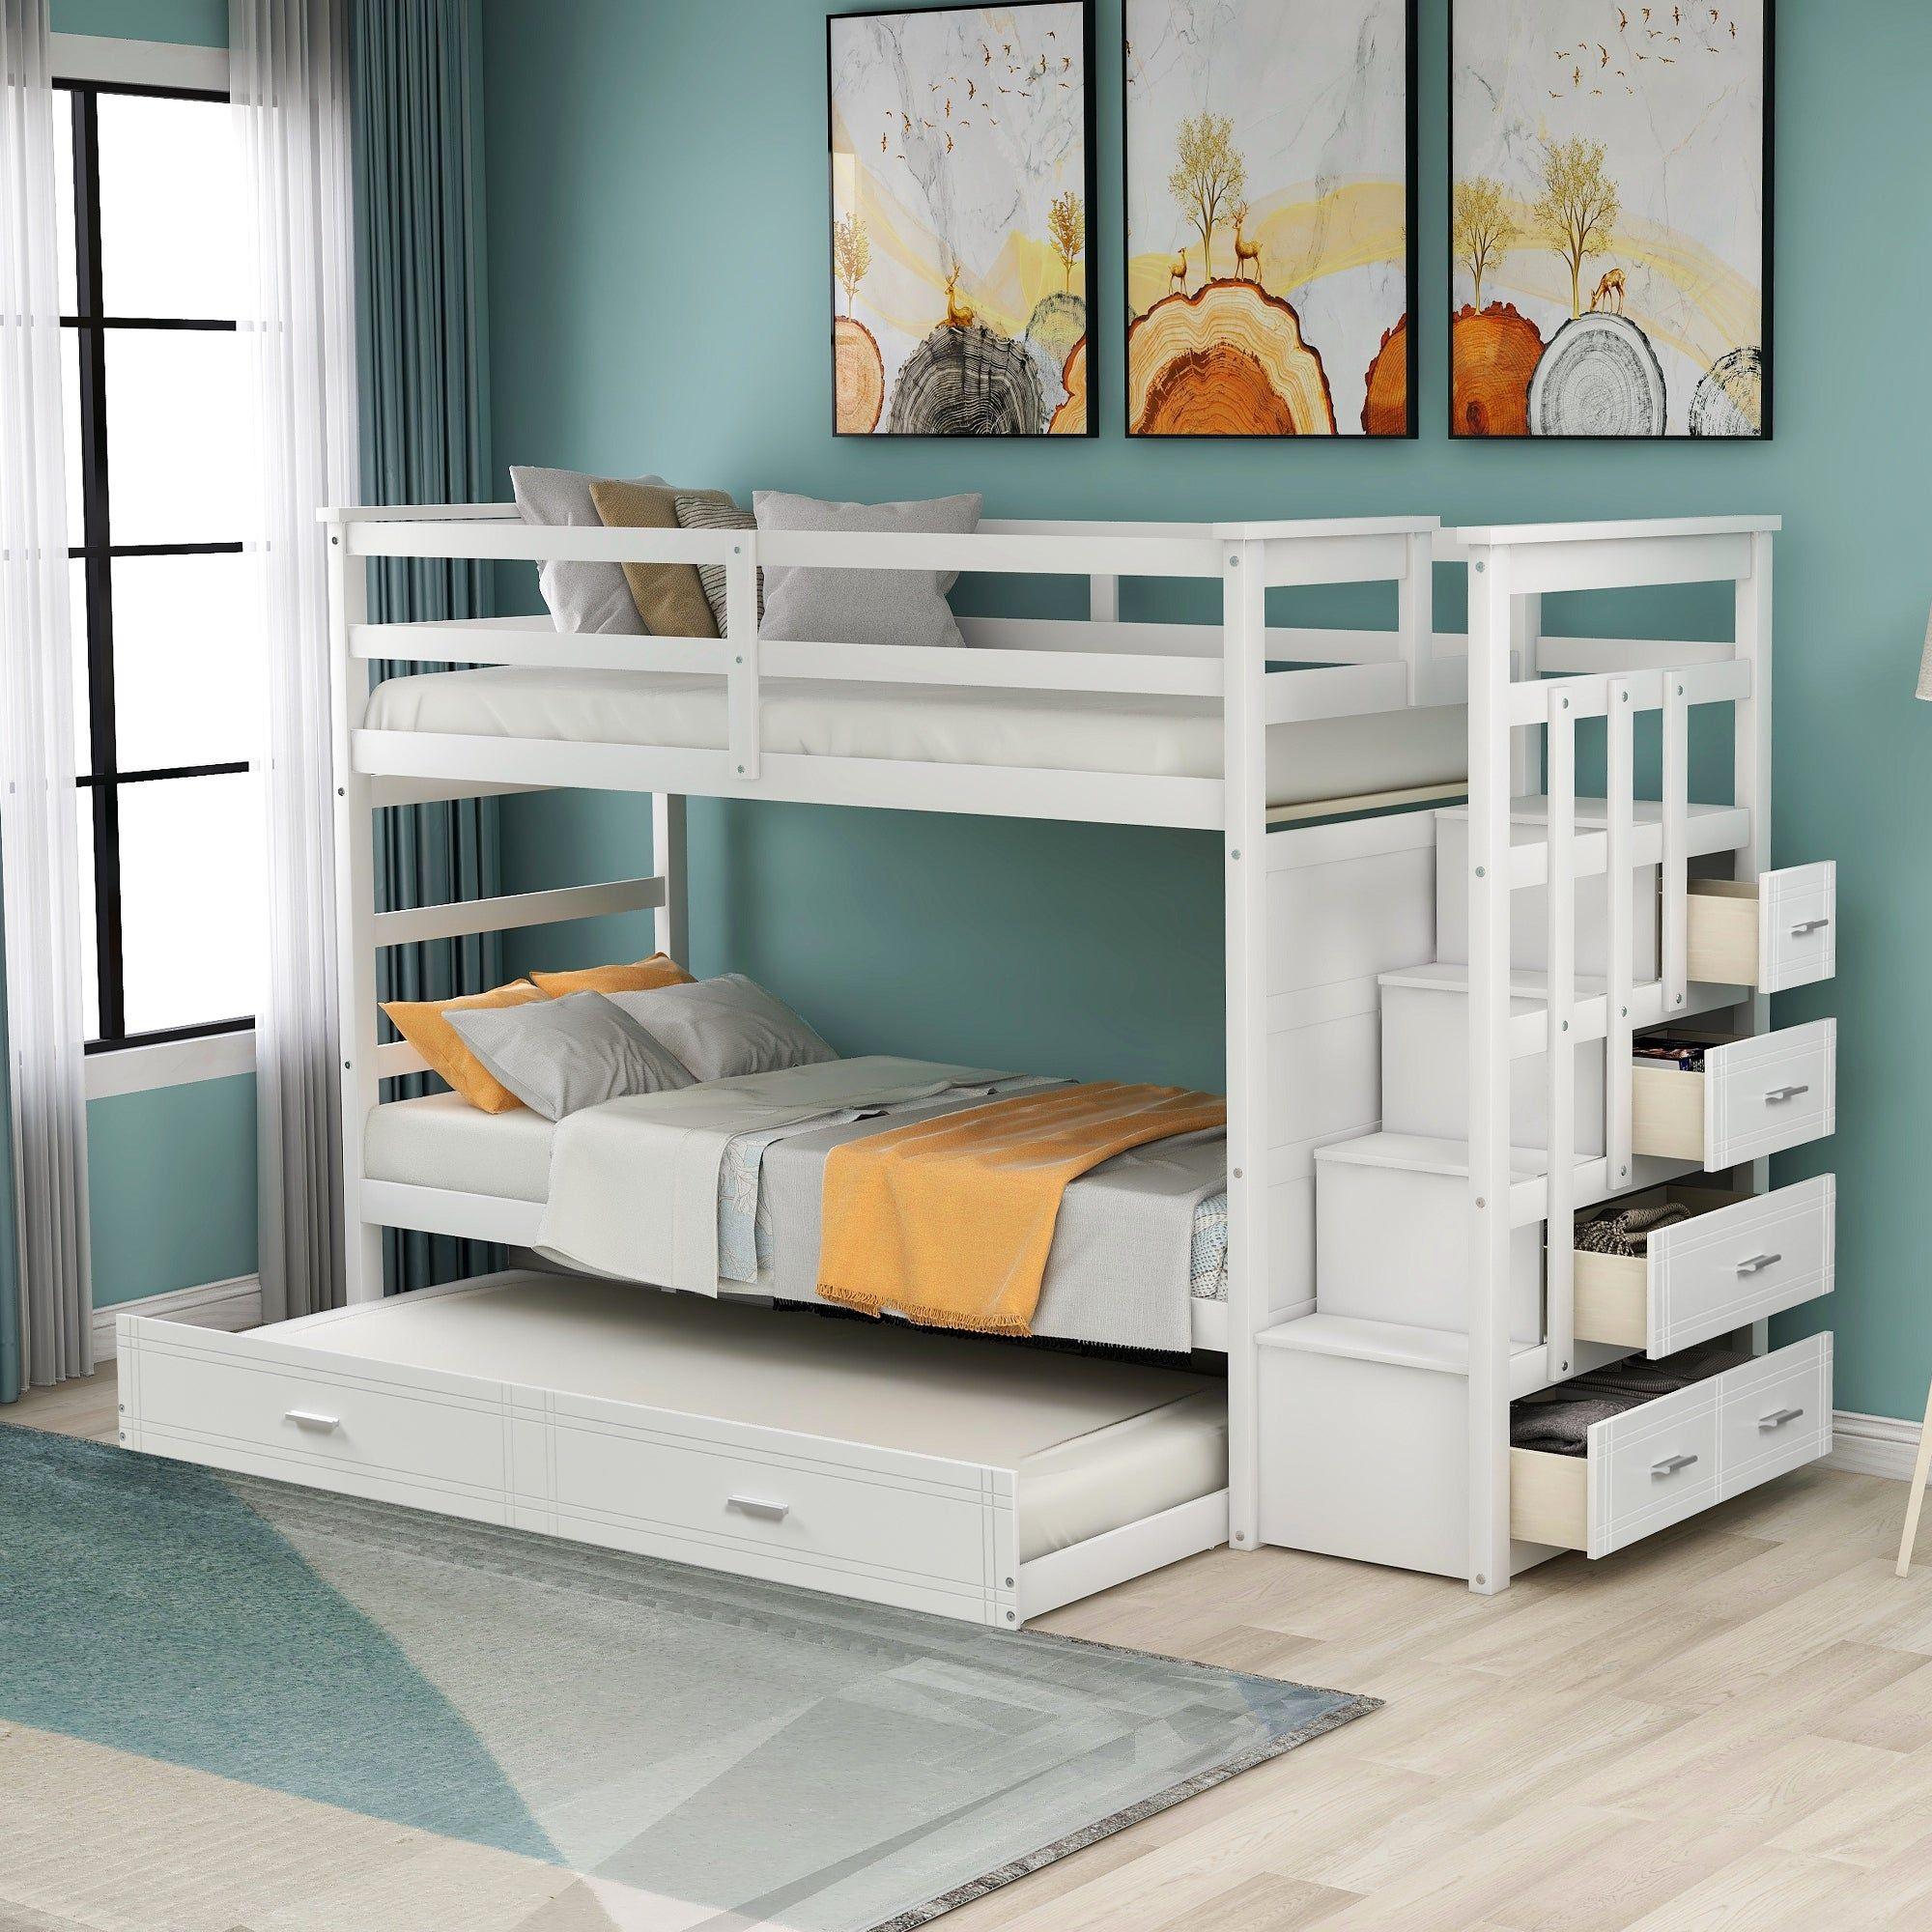 Osgoyrt3zlba7m Twin bunk beds with drawers